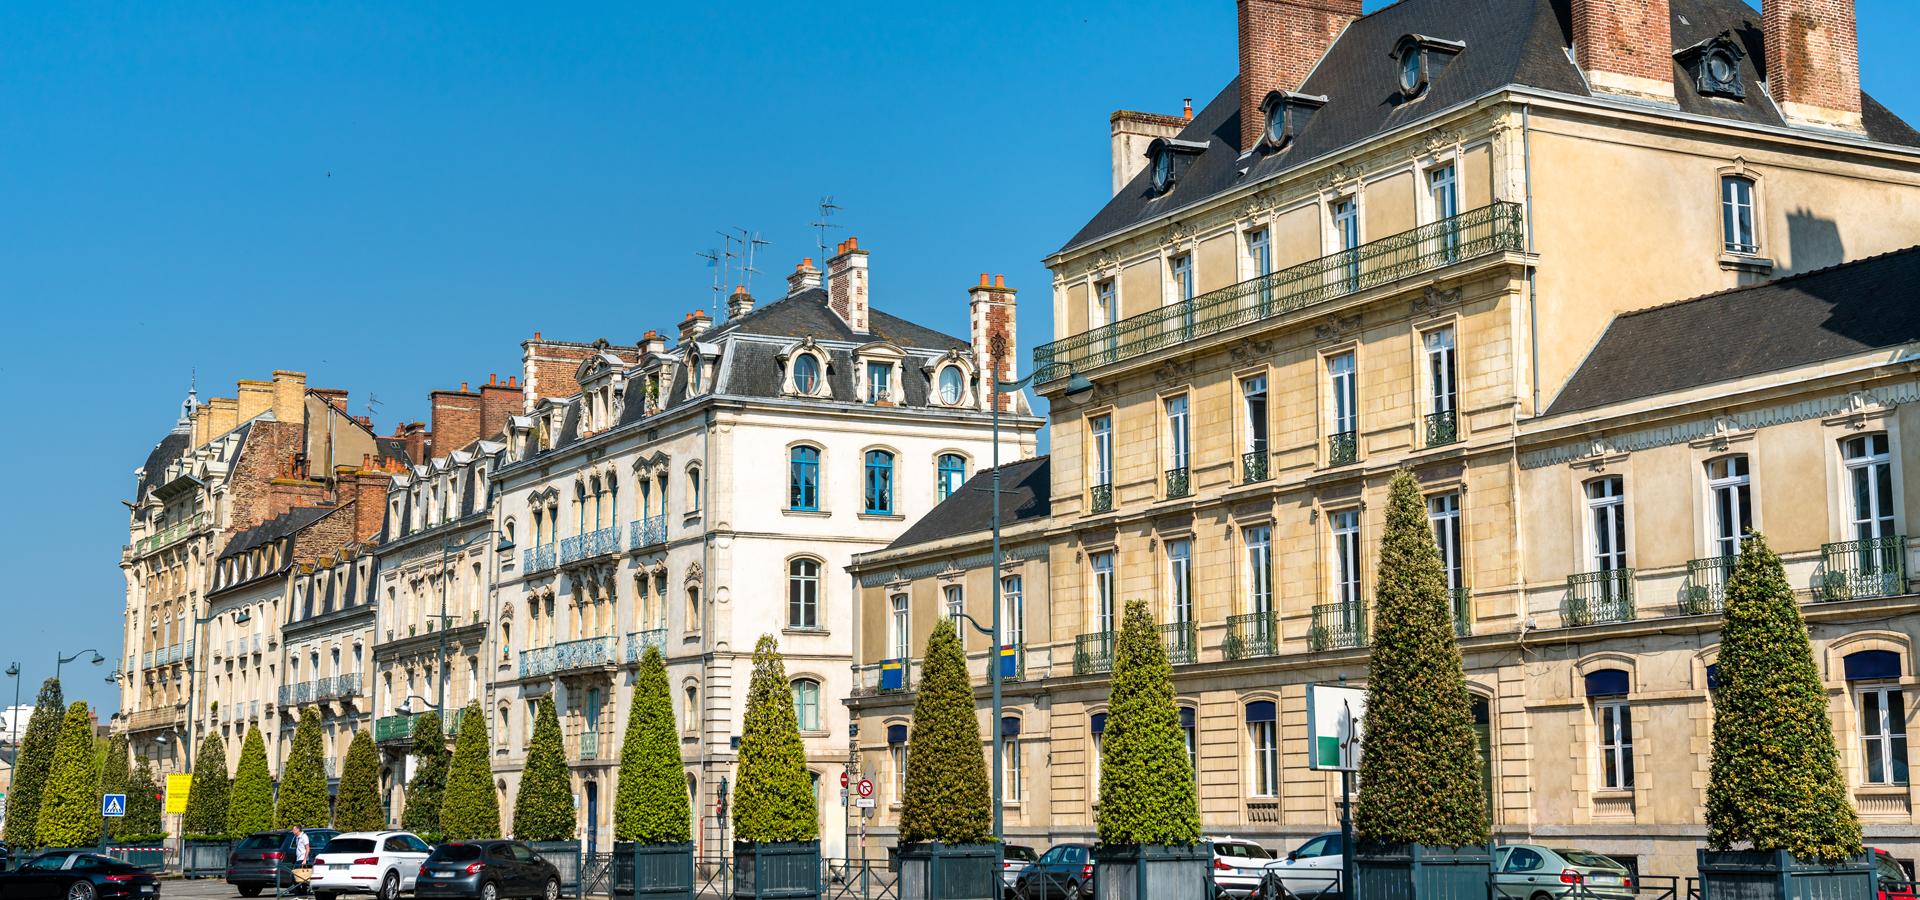 Peer-to-peer advisory in Rennes, Ille-et-Vilaine Département, Brittany, France